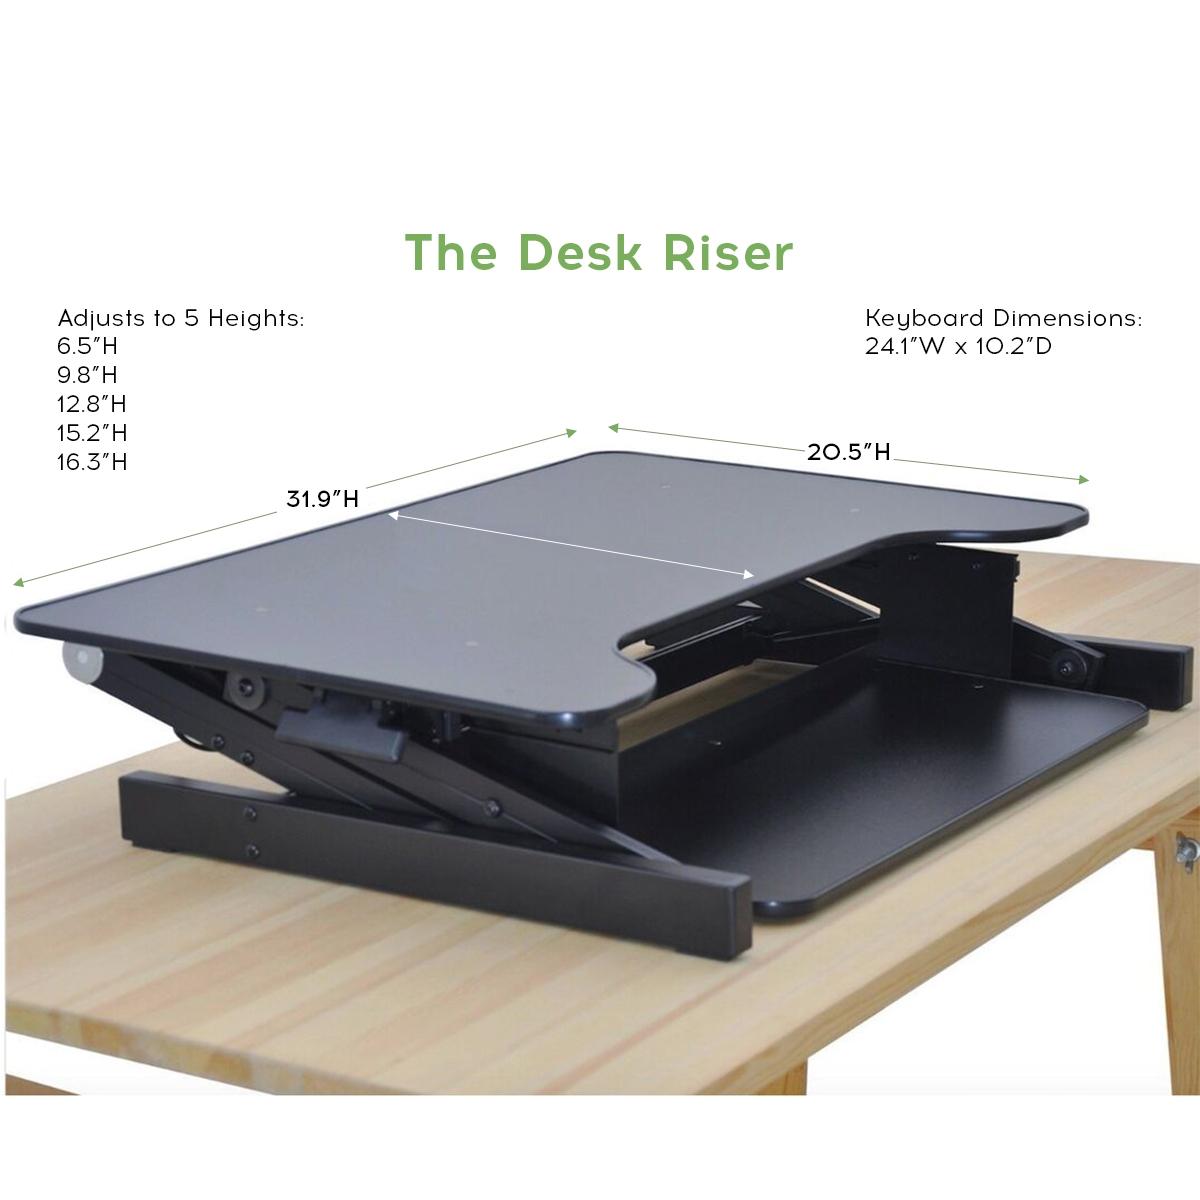 Standing Desk the DeskRiser Height Adjustable Heavy Duty sit